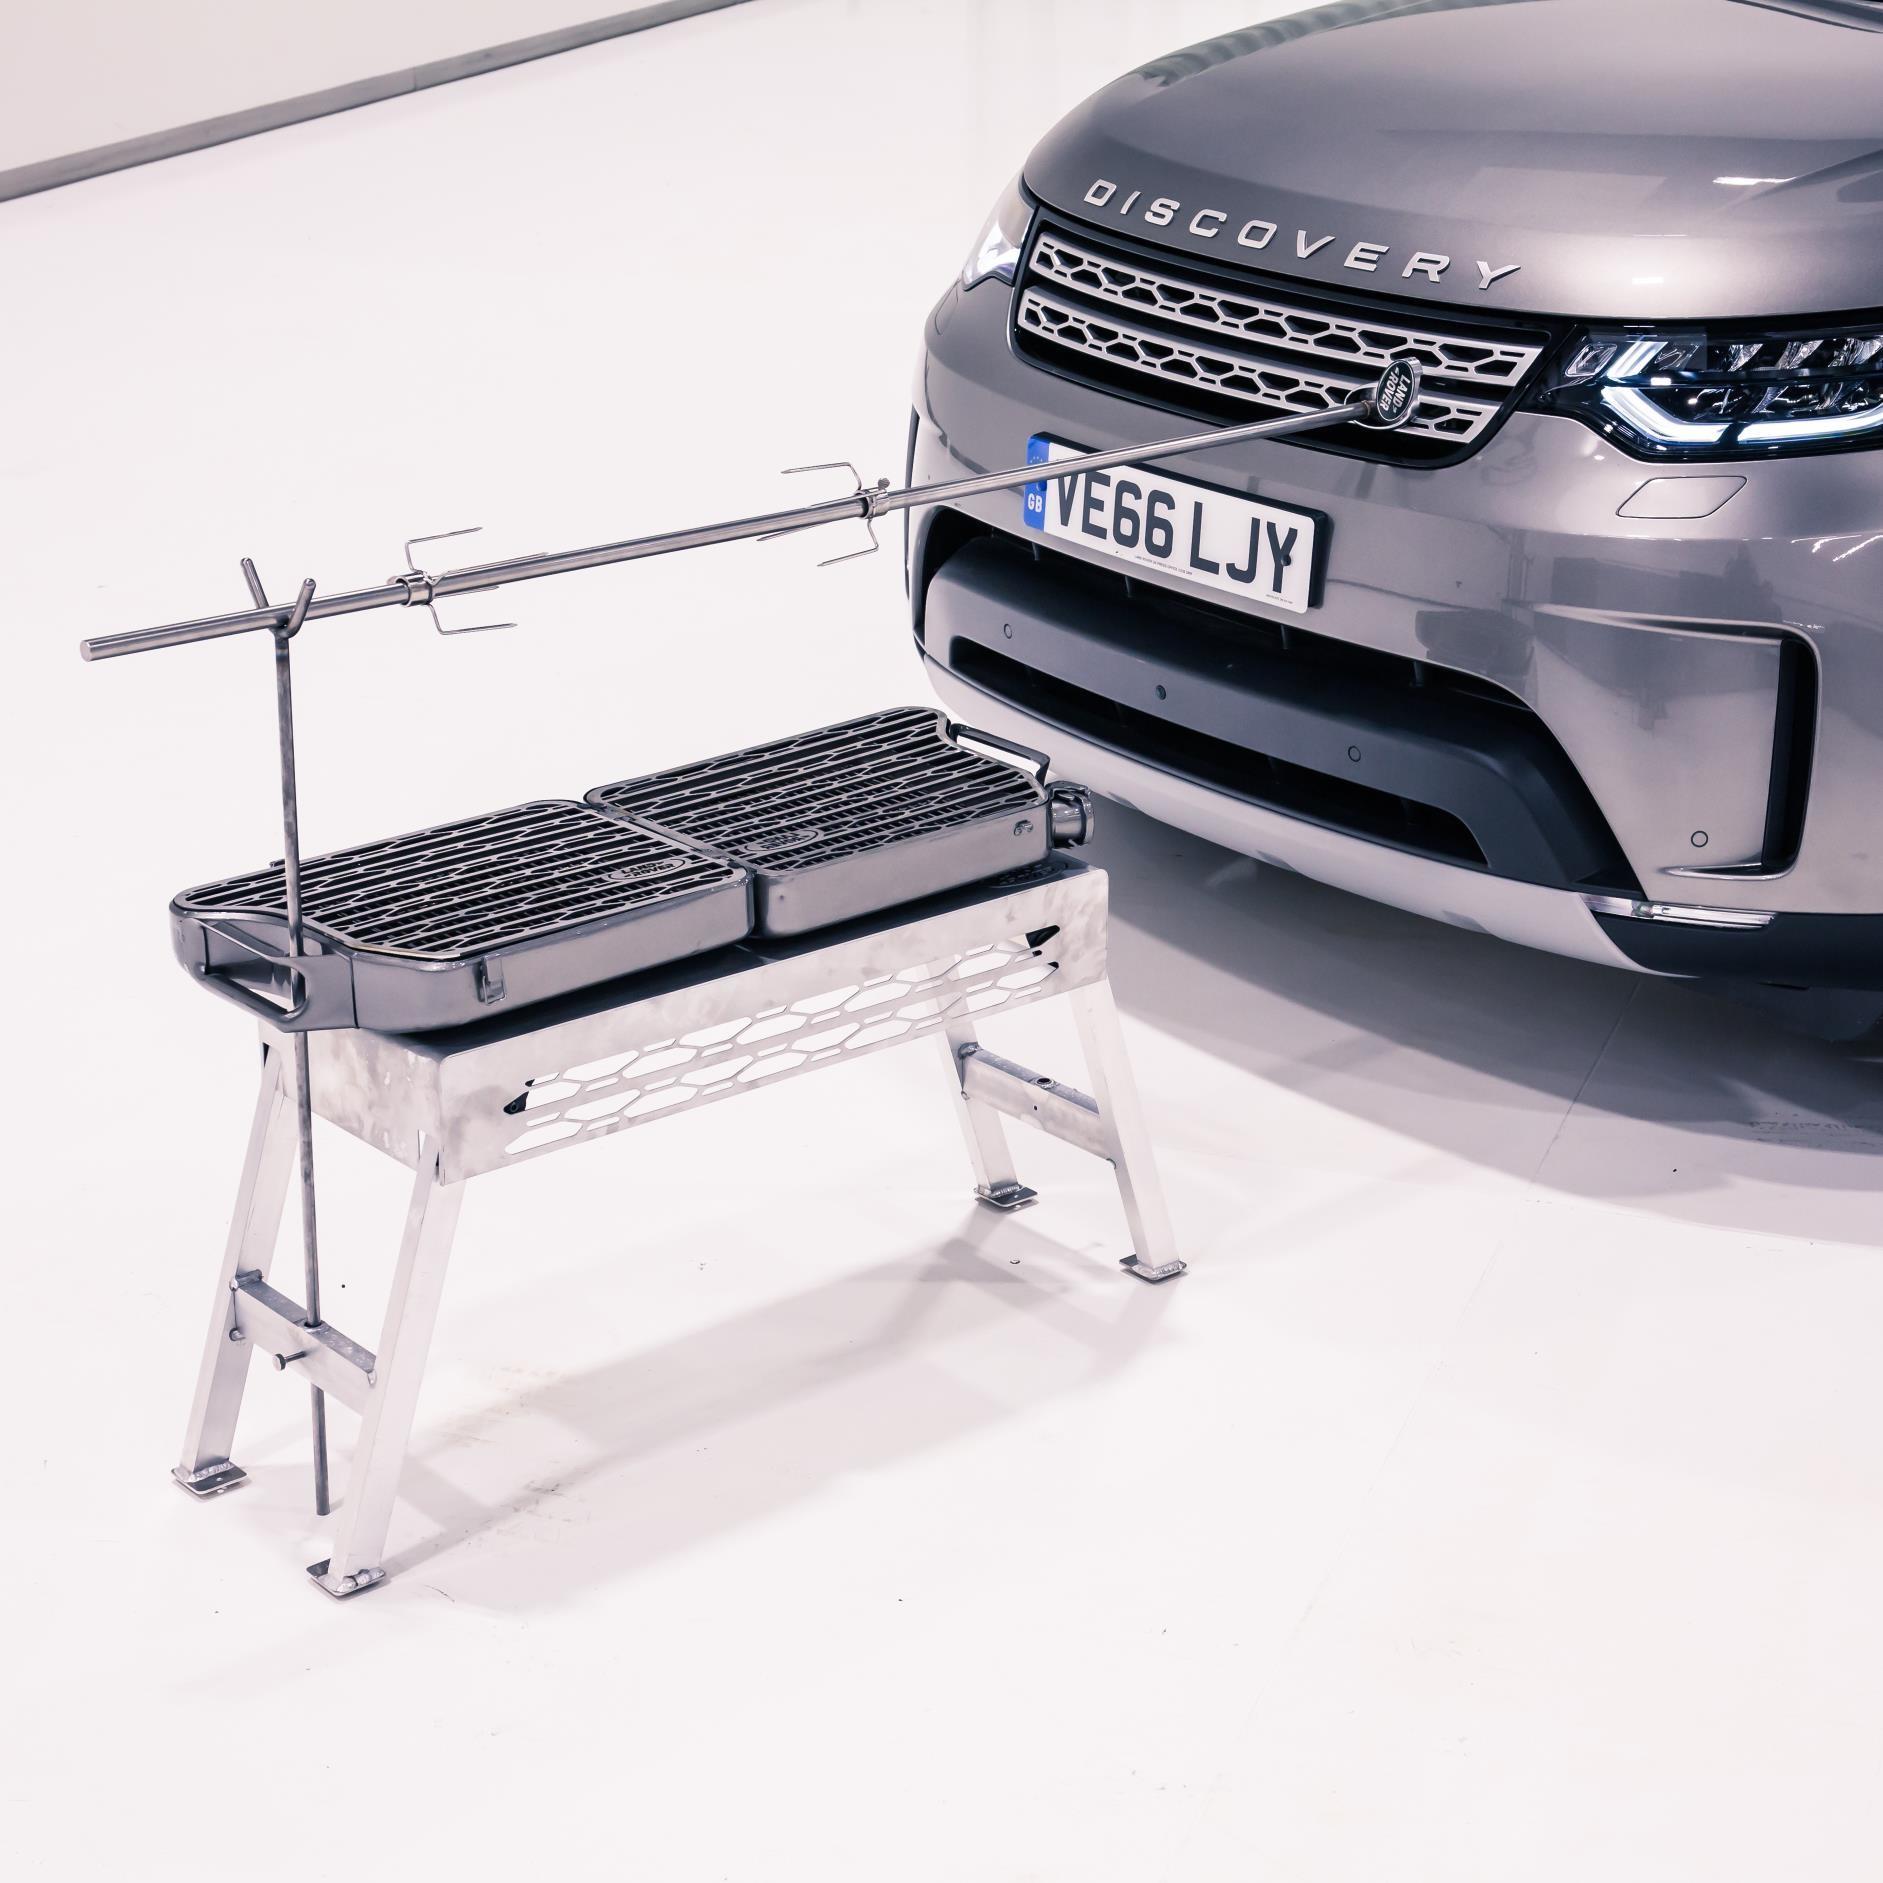 Foto de Land Rover Duscovery cocina ambulante (2/17)